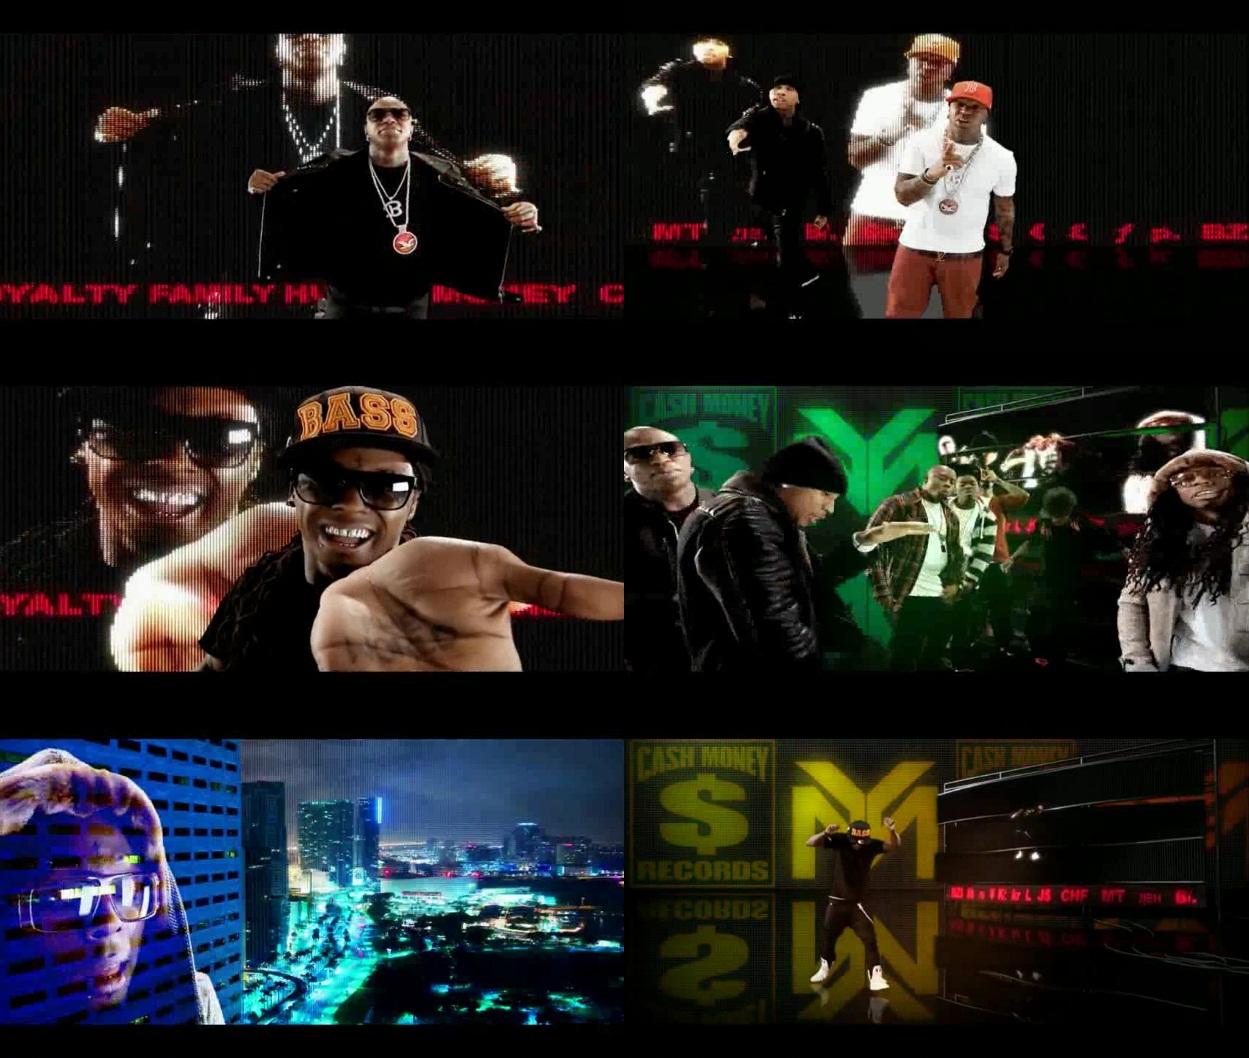 http://4.bp.blogspot.com/-HiInvcrHWo4/UDjMLXTWRxI/AAAAAAAACeQ/1fsDRe8bzm4/s1600/Loyalty.jpg